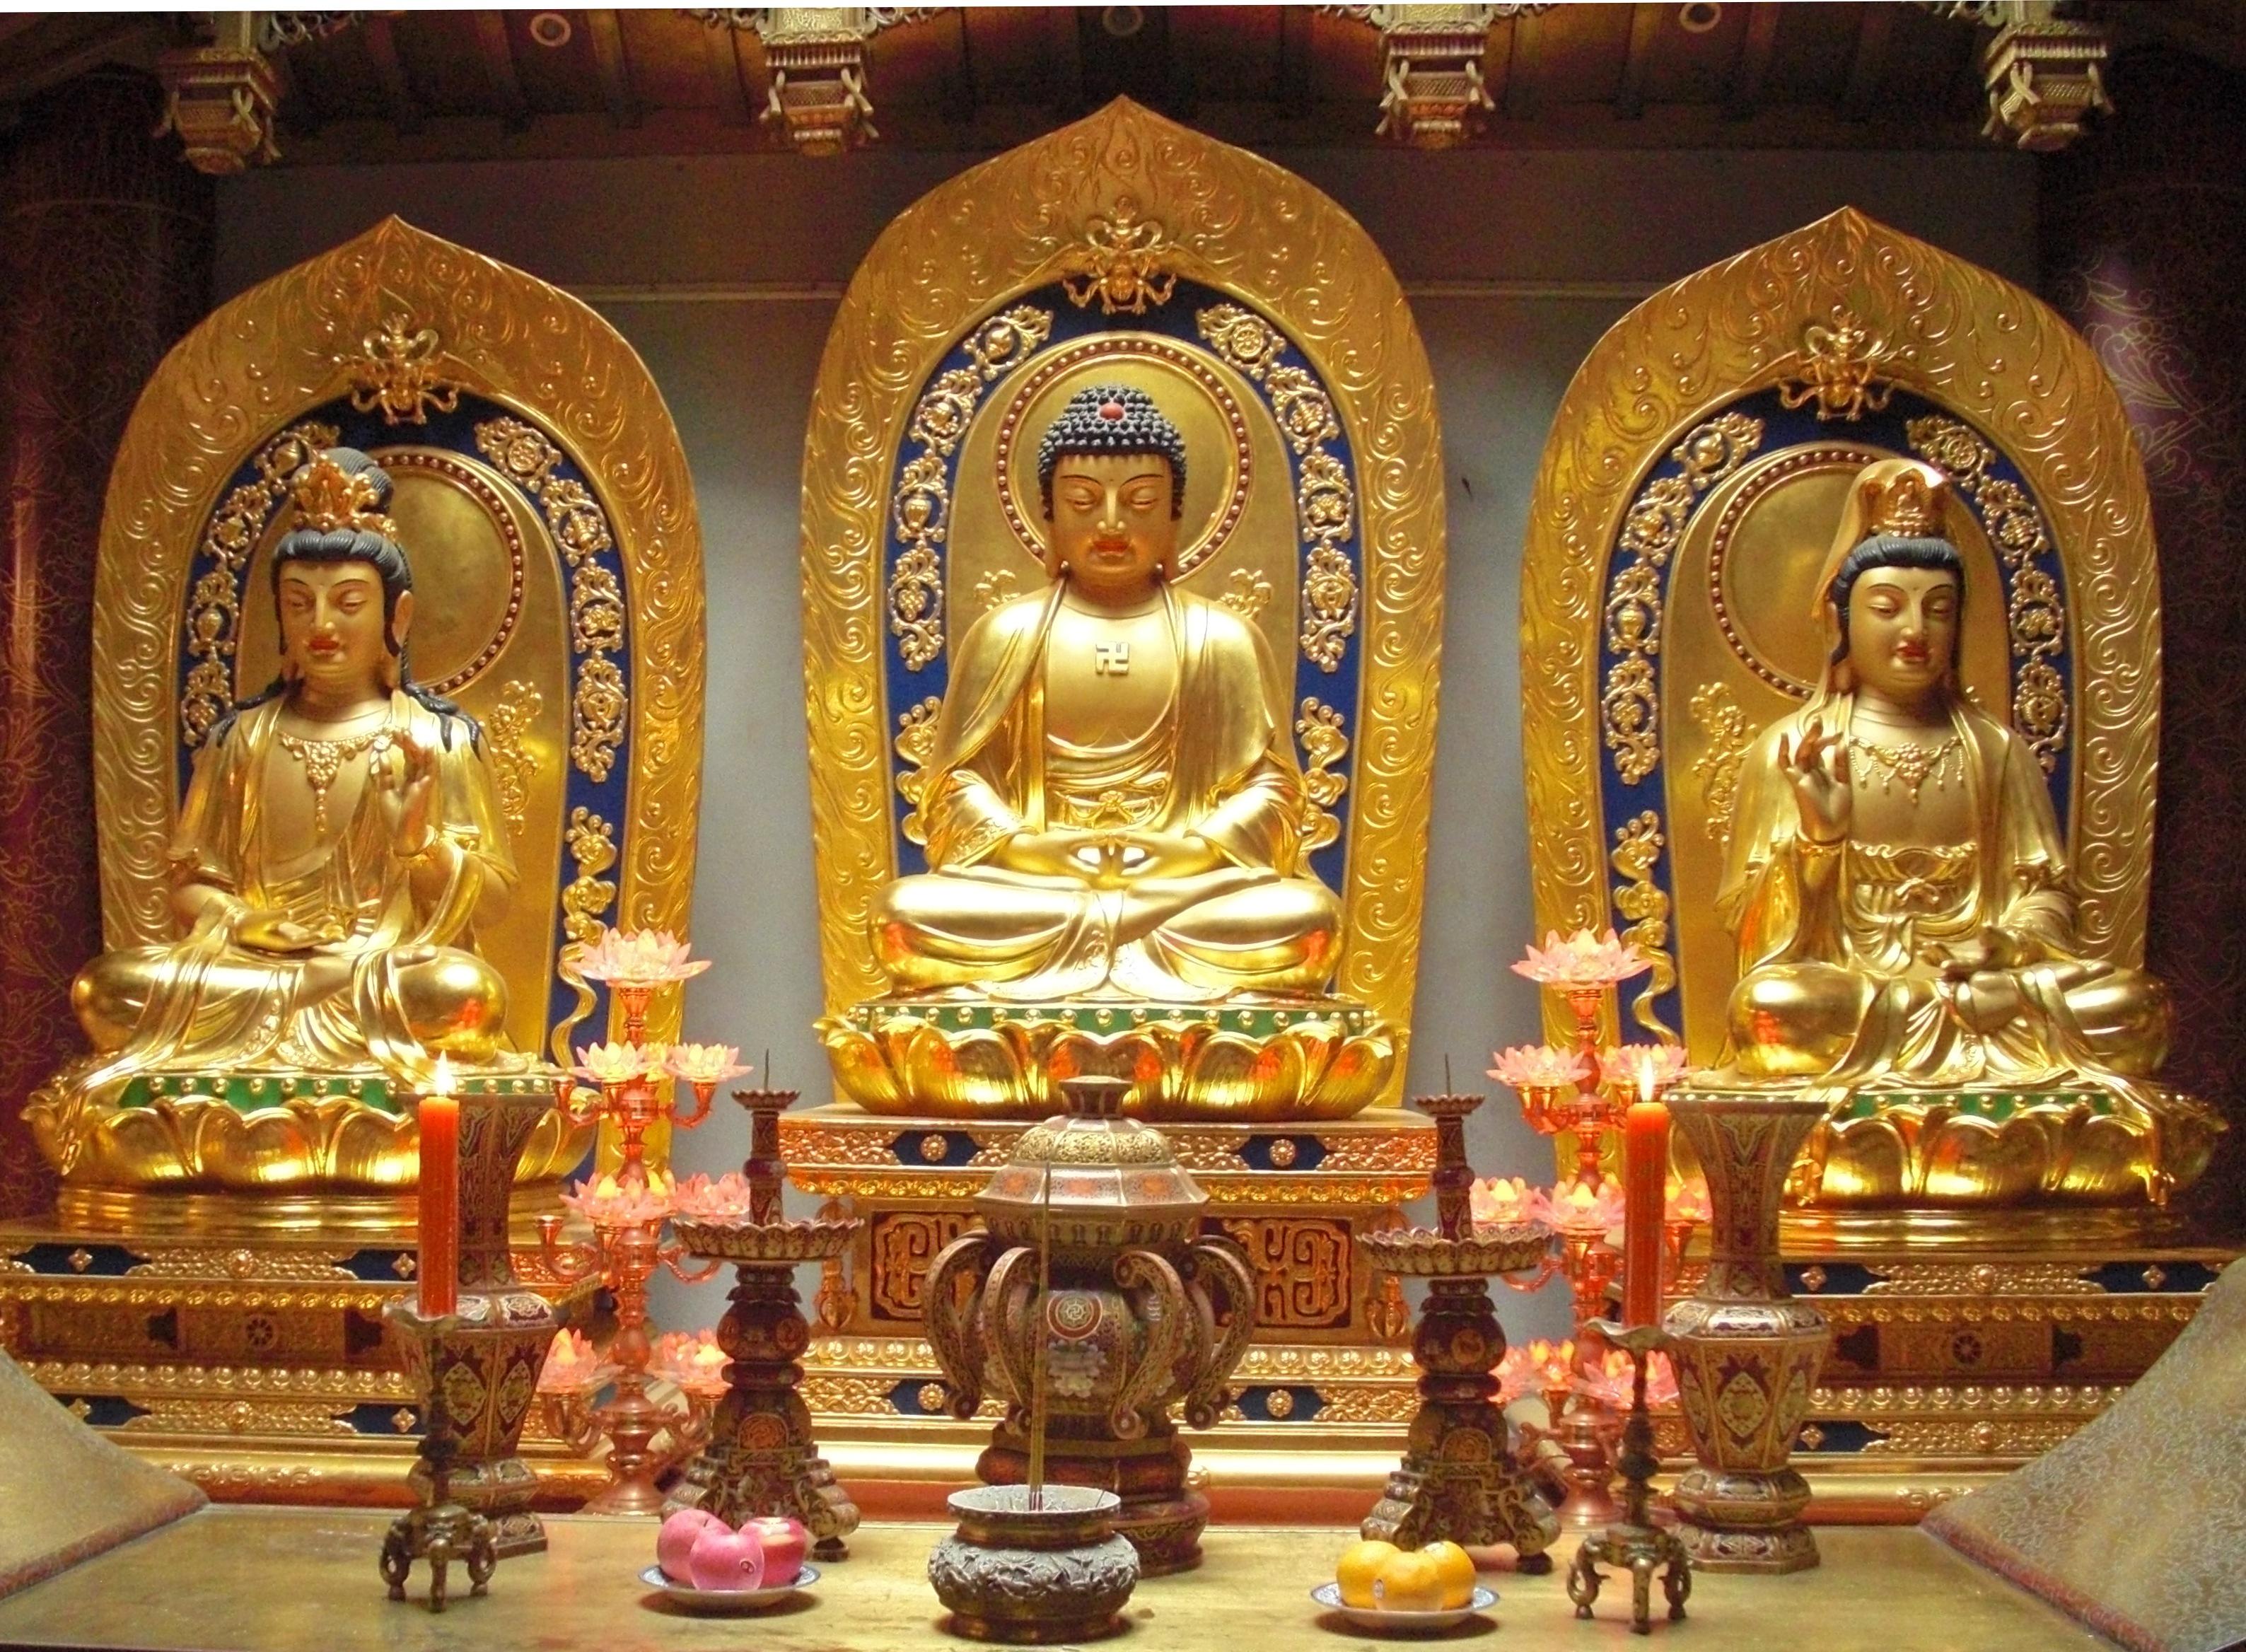 https://i1.wp.com/upload.wikimedia.org/wikipedia/commons/a/ae/Amitabha_Buddha_and_Bodhisattvas.jpeg